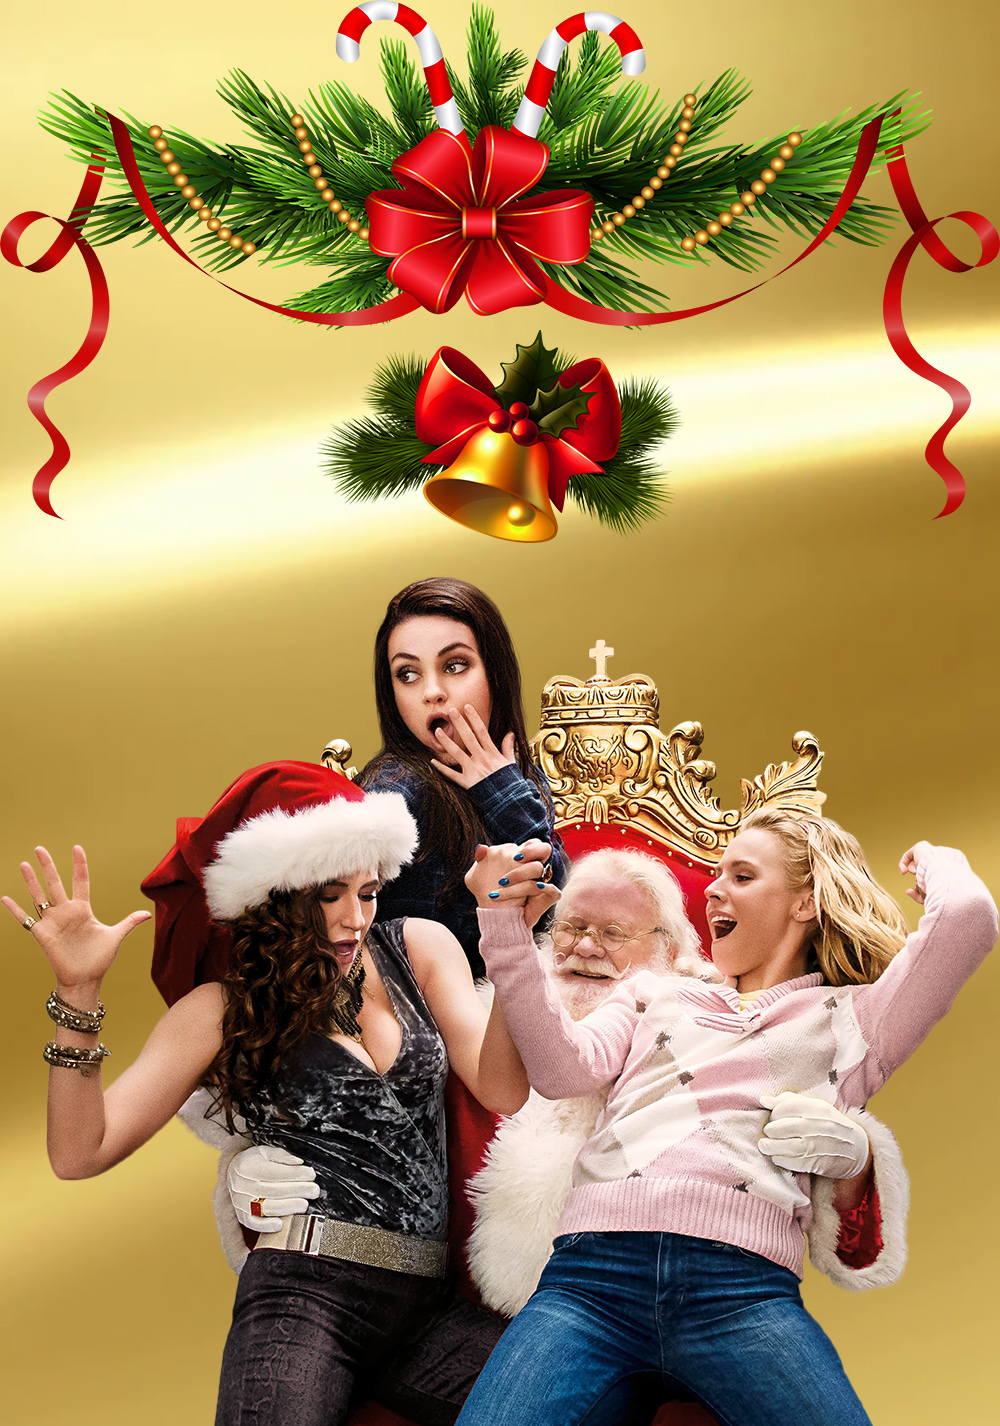 A Bad Moms Christmas Movie Poster.A Bad Moms Christmas Movie Fanart Fanart Tv